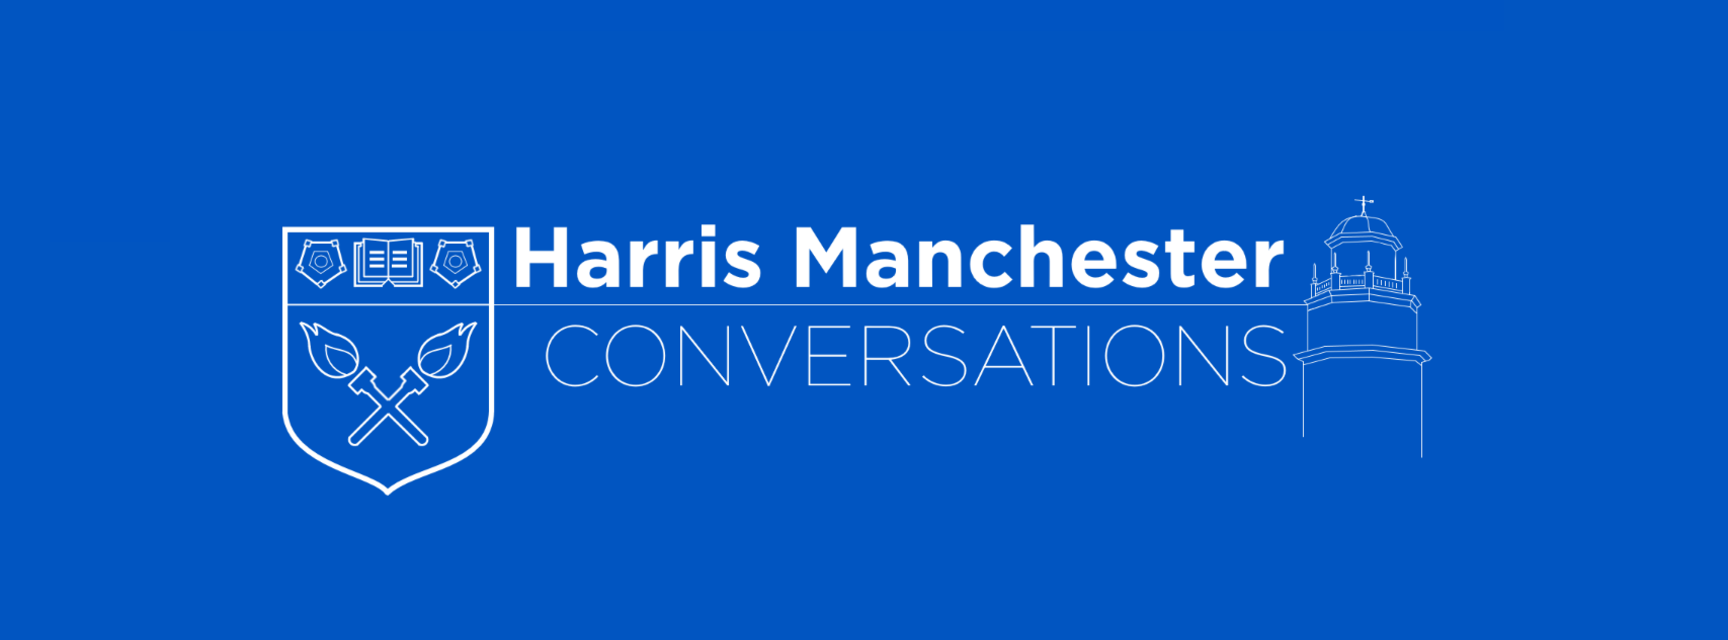 harris manc conversations small